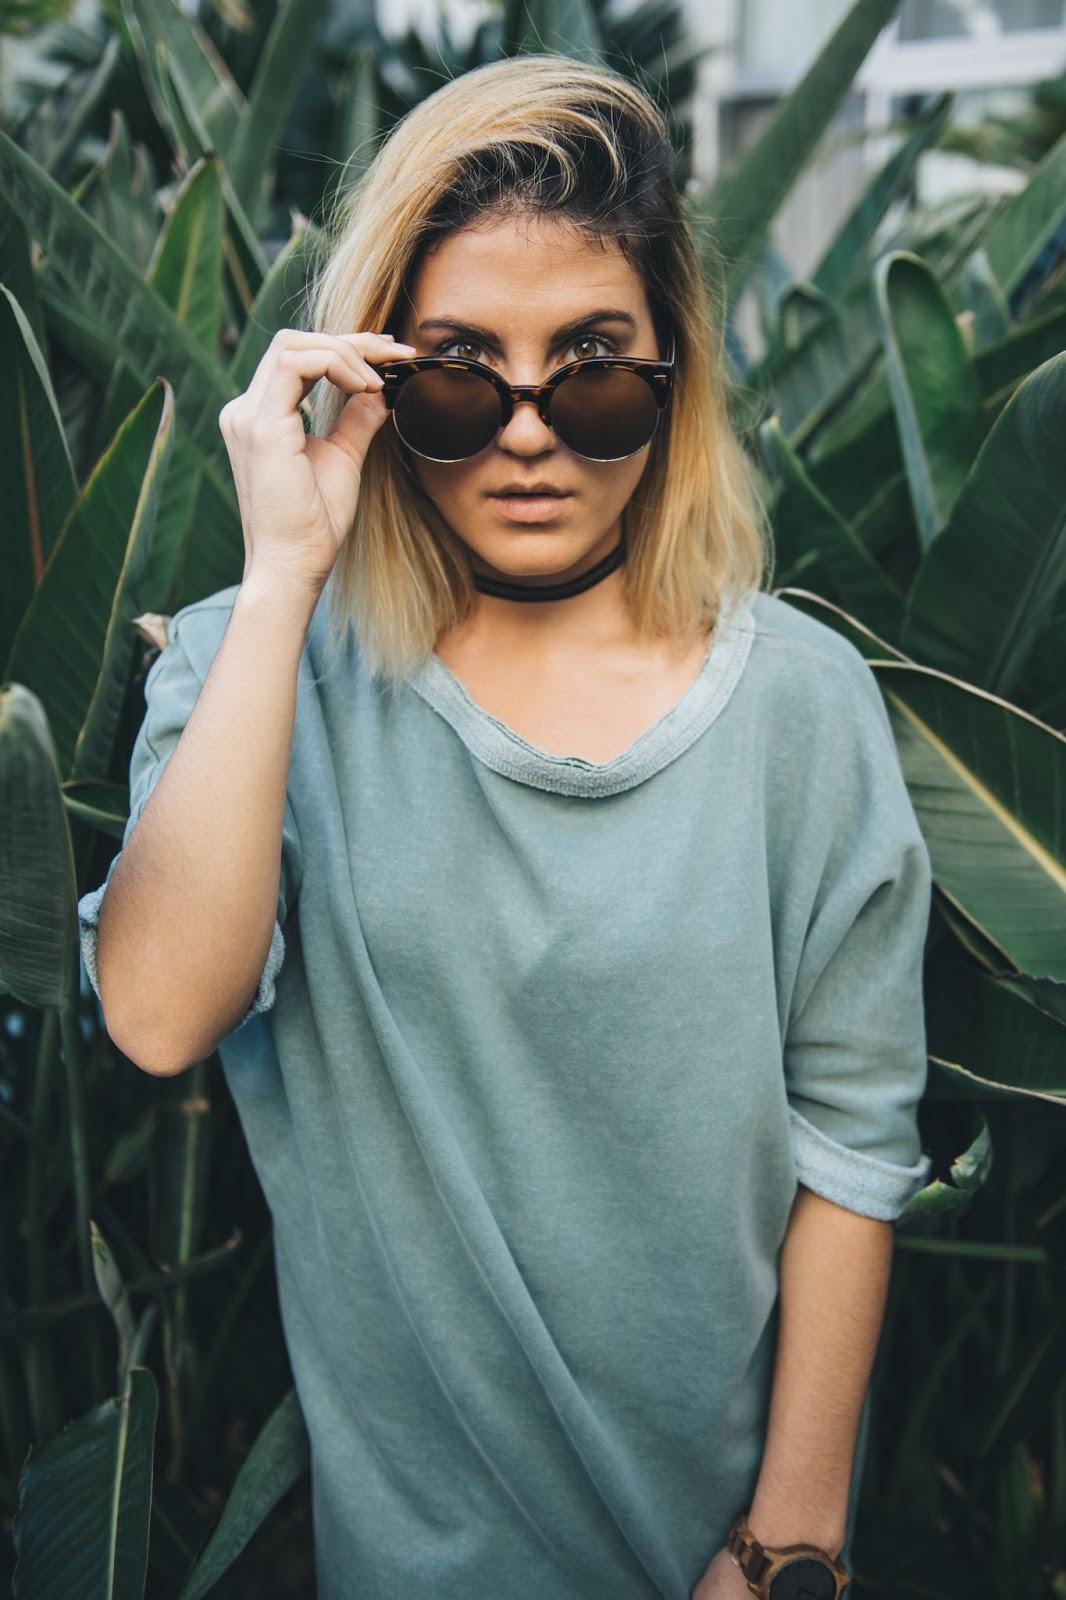 Urban Outfitters Sunglasses #UOonYou - @taylorwinkelmeyer